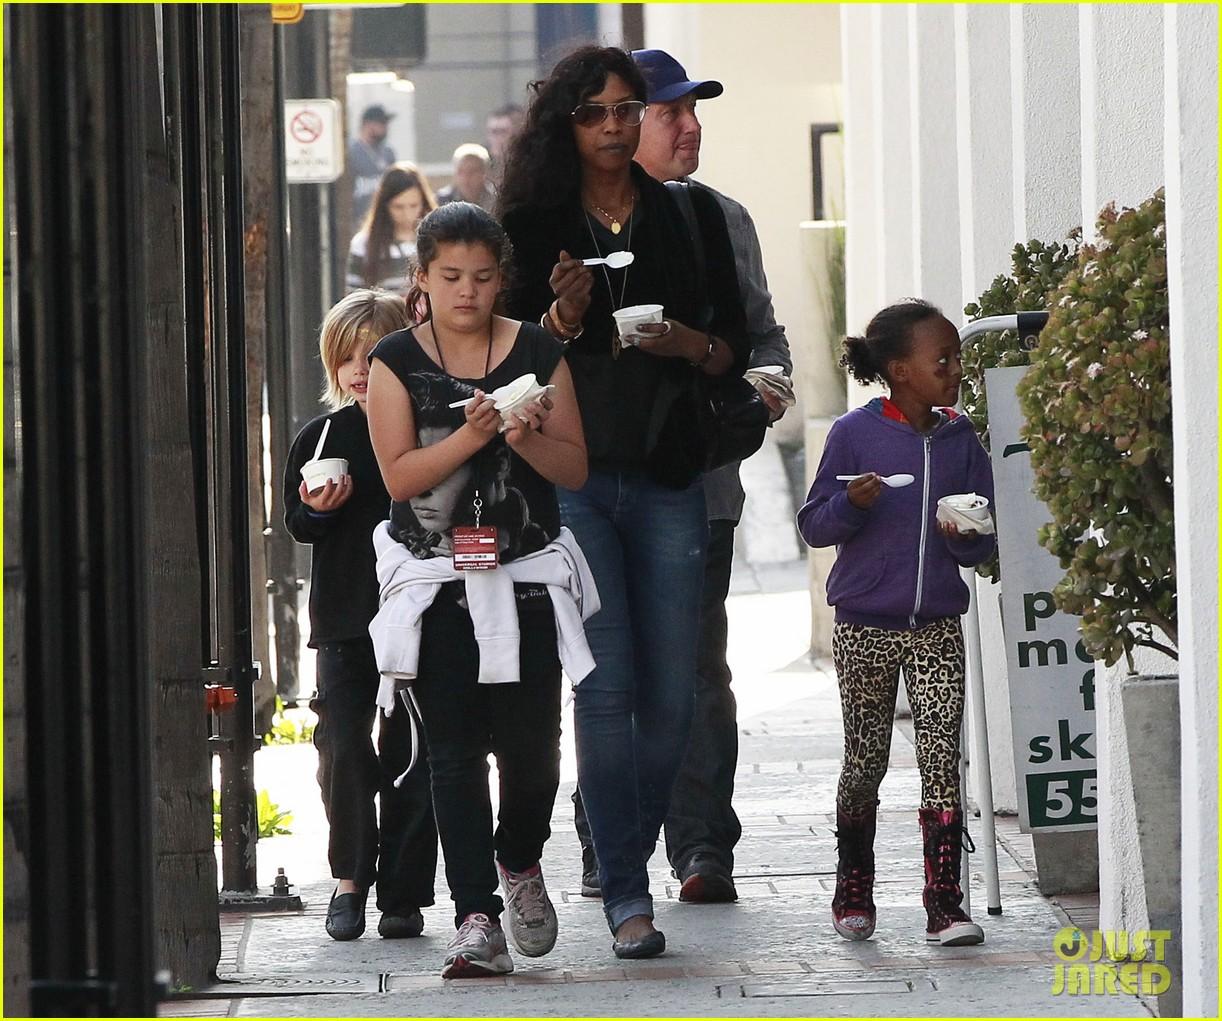 Zahara Jolie-Pitt 2013 1222 x 1021 · 340 kB · jpeg